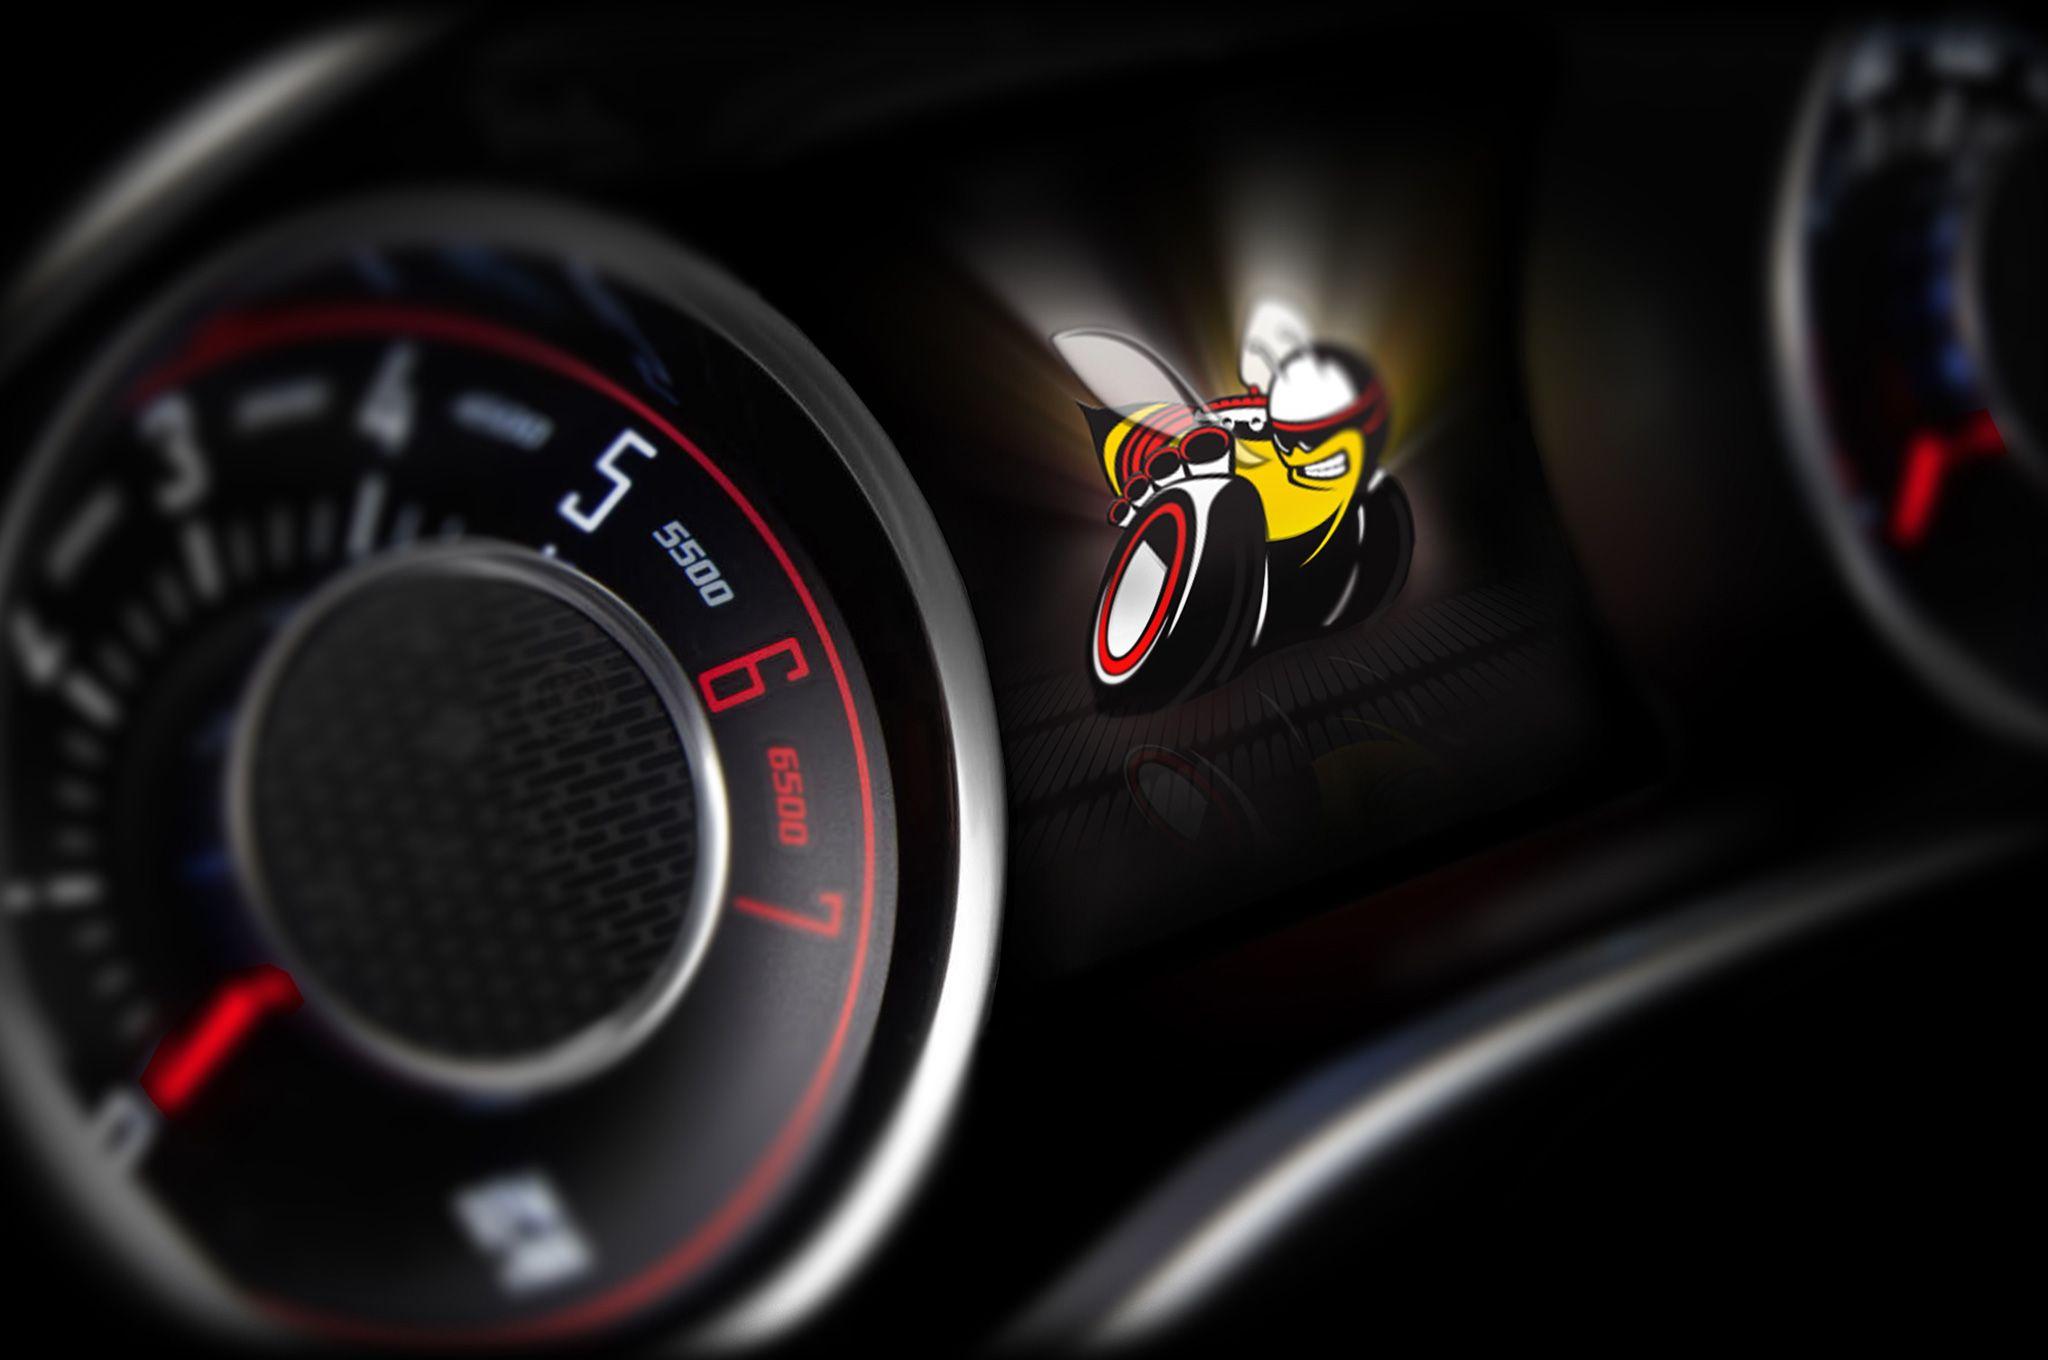 2014 Dodge Dart SRT4 Interior is hd wallpaper for desktop 2048x1360